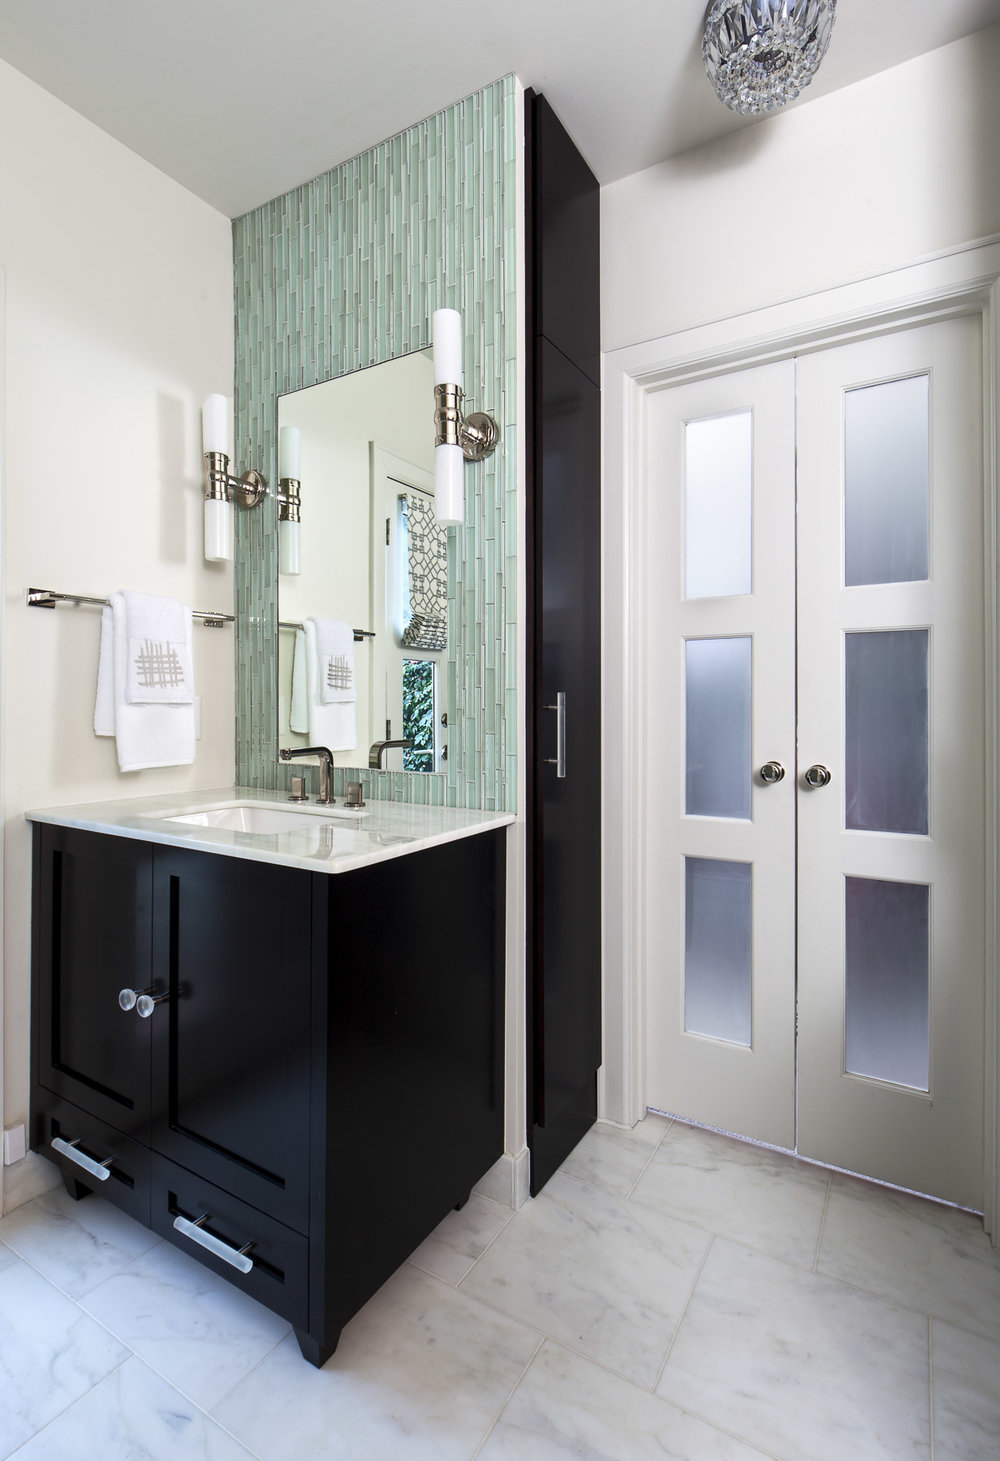 Charlotte_Advertising_Photographer-bathrooms-3.jpg